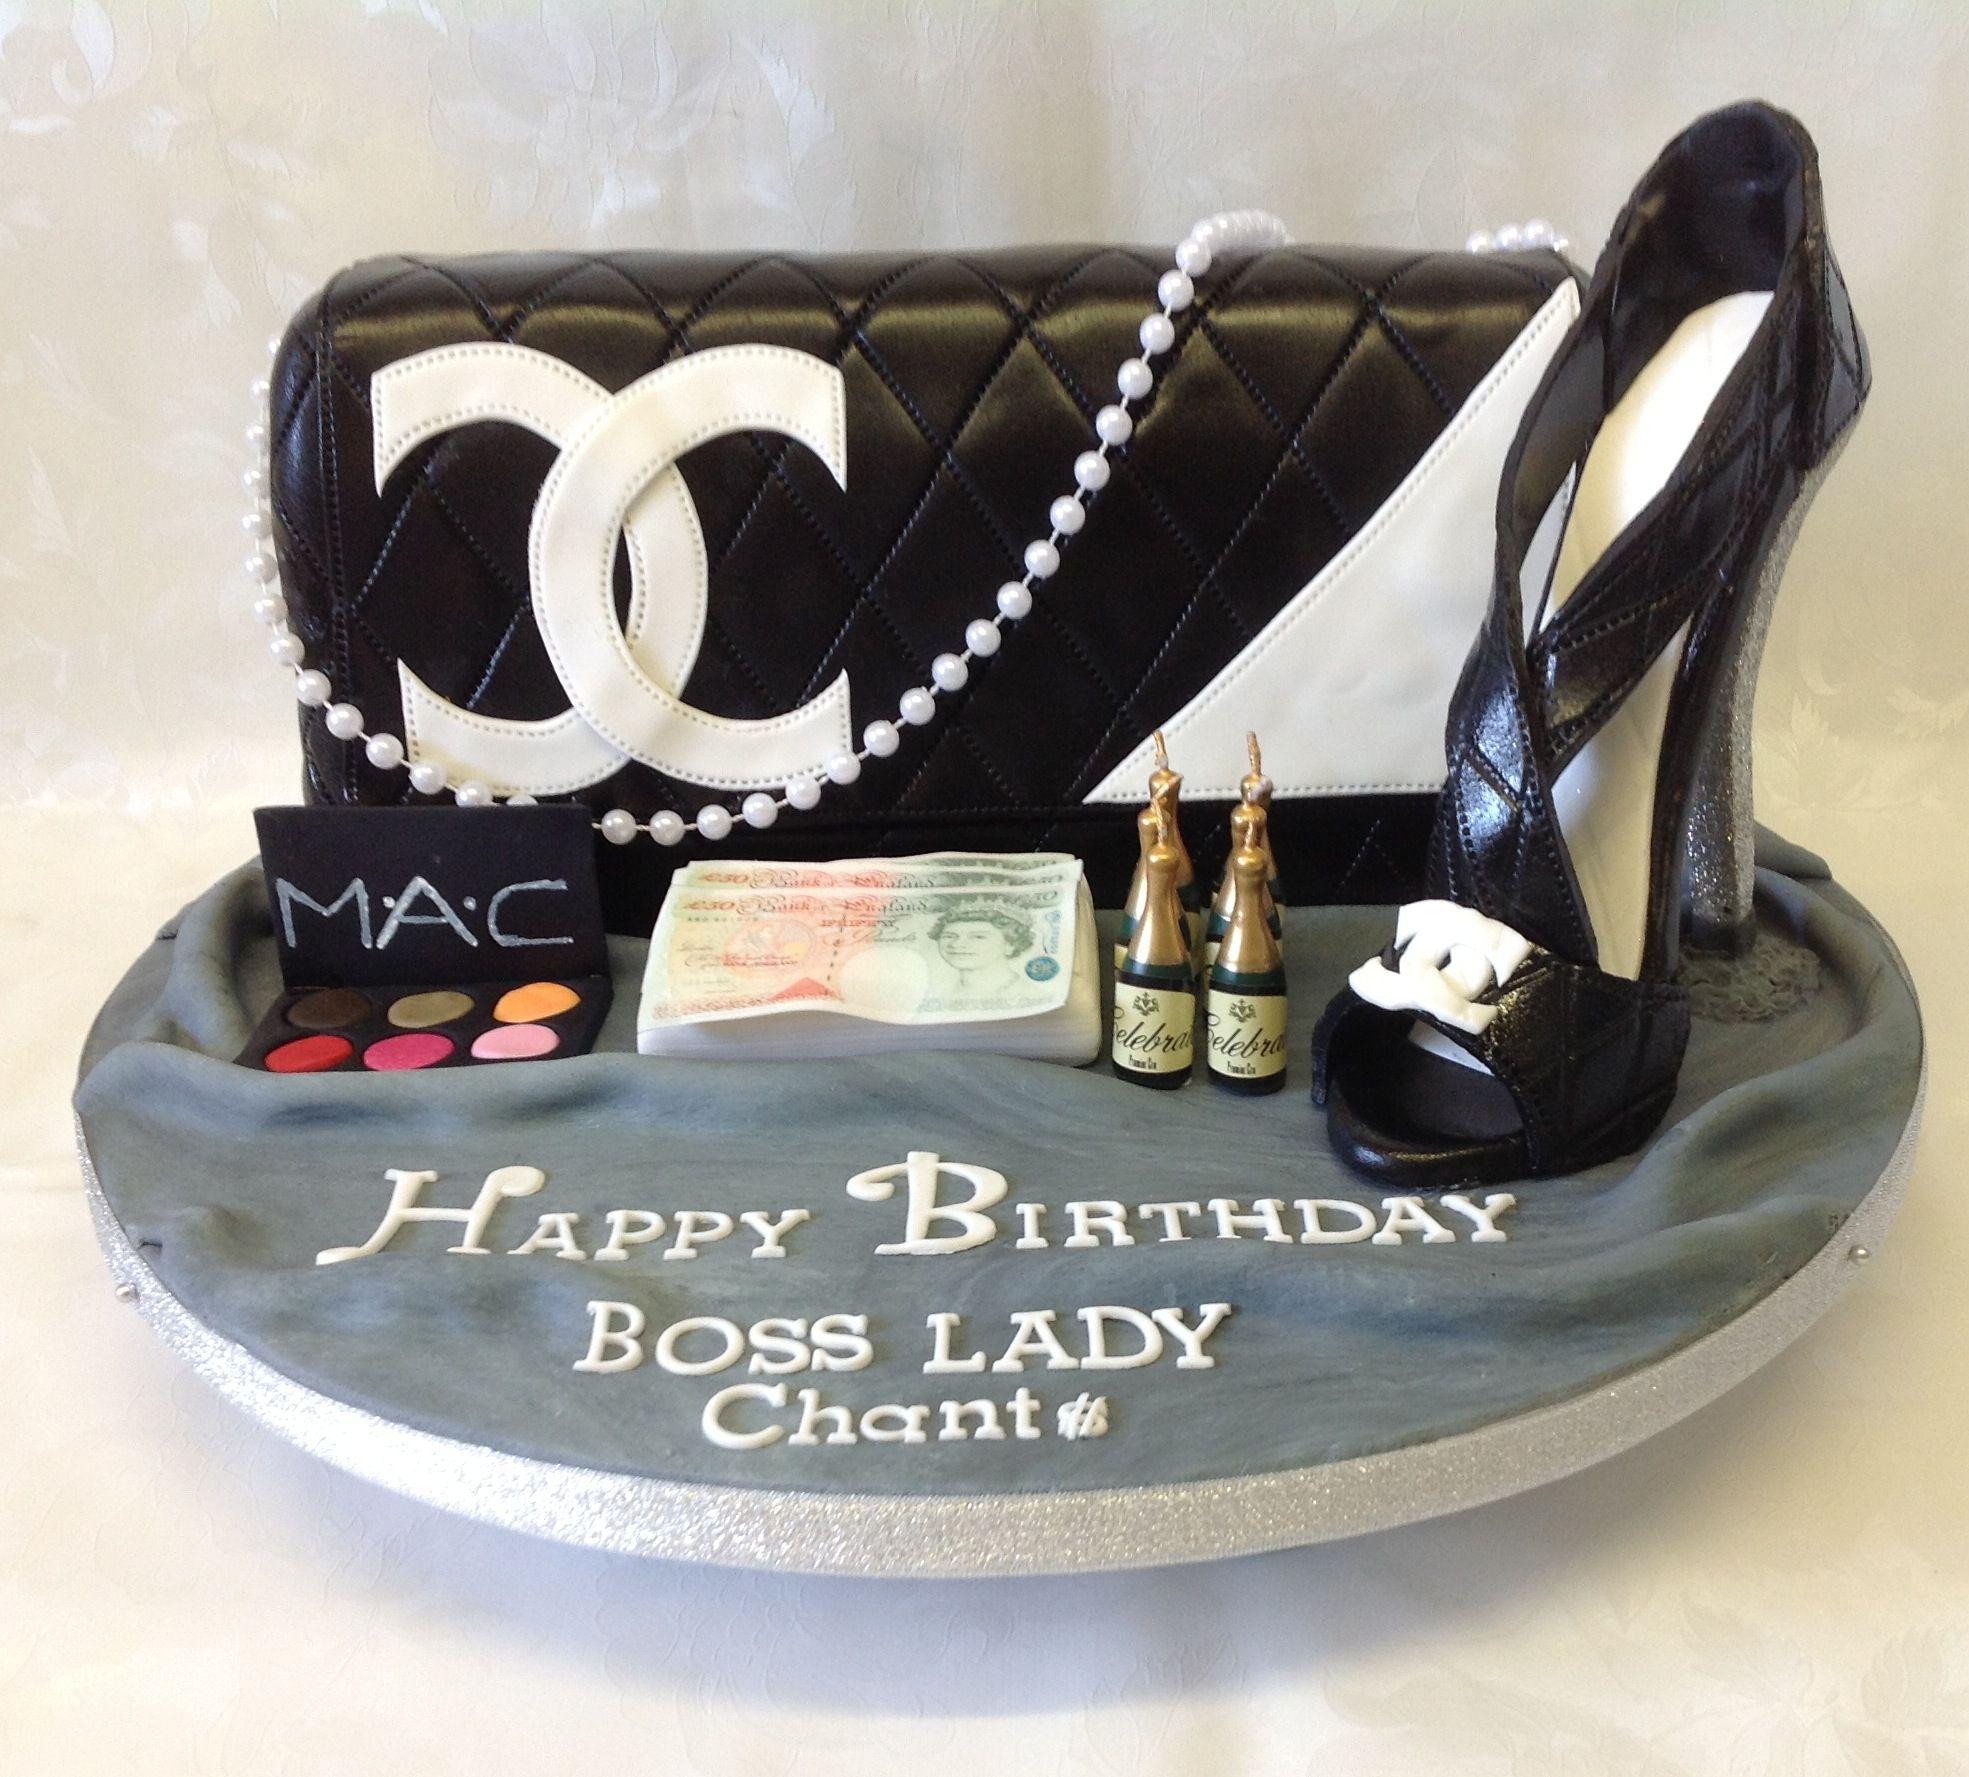 Channel Black White Handbag And Shoe Cake Con Imagenes